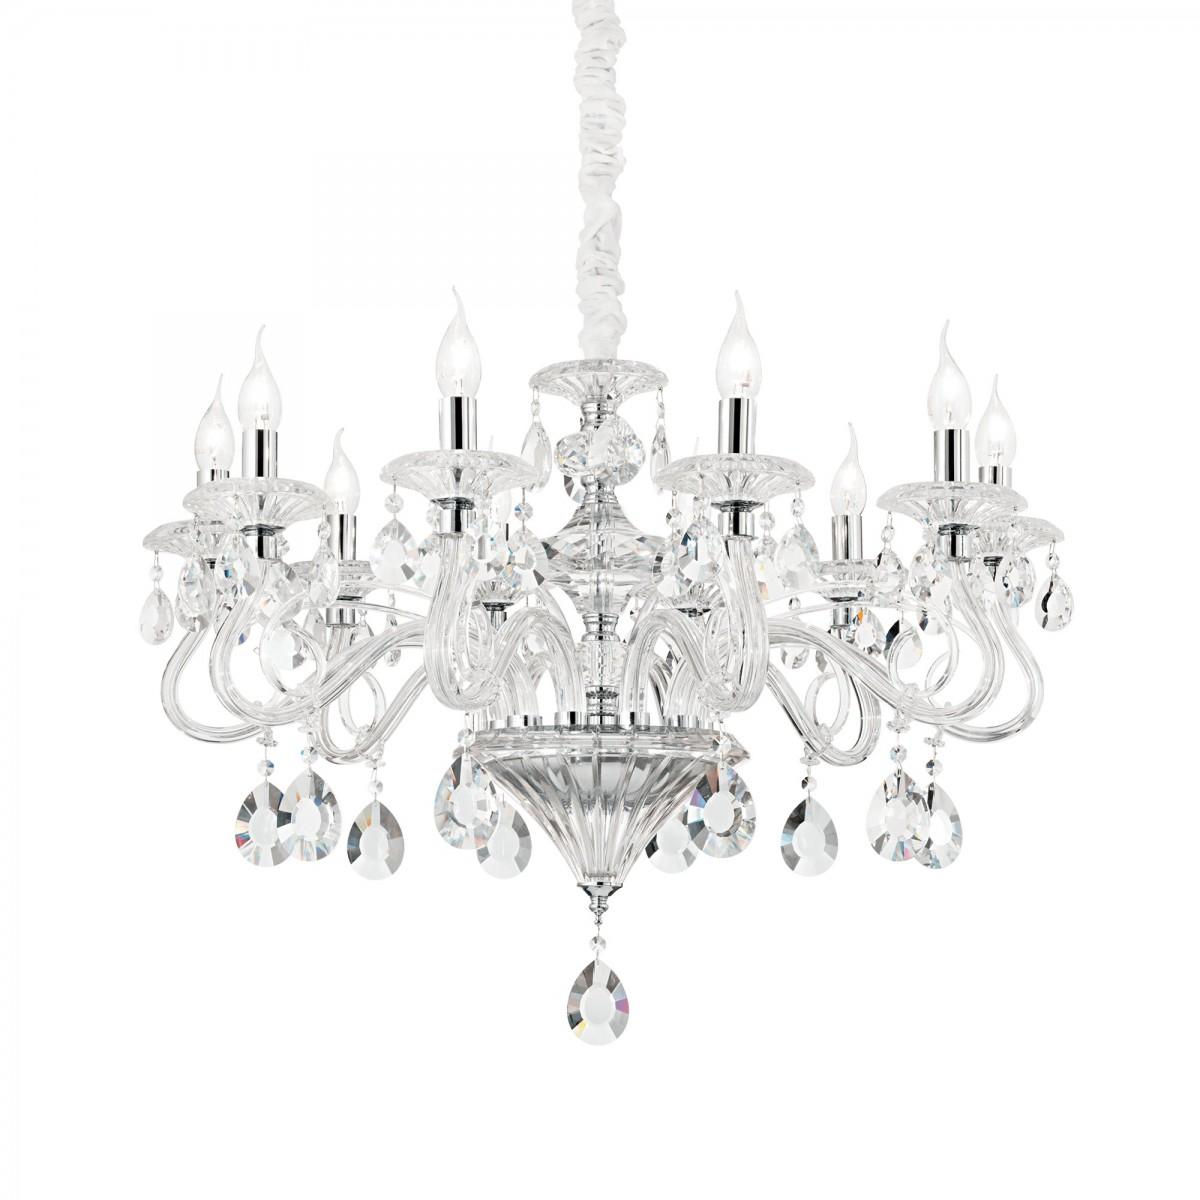 závěsné svítidlo lustr Ideal lux Negresco SP10 141060 10x40W E14 - dekorativní luxus